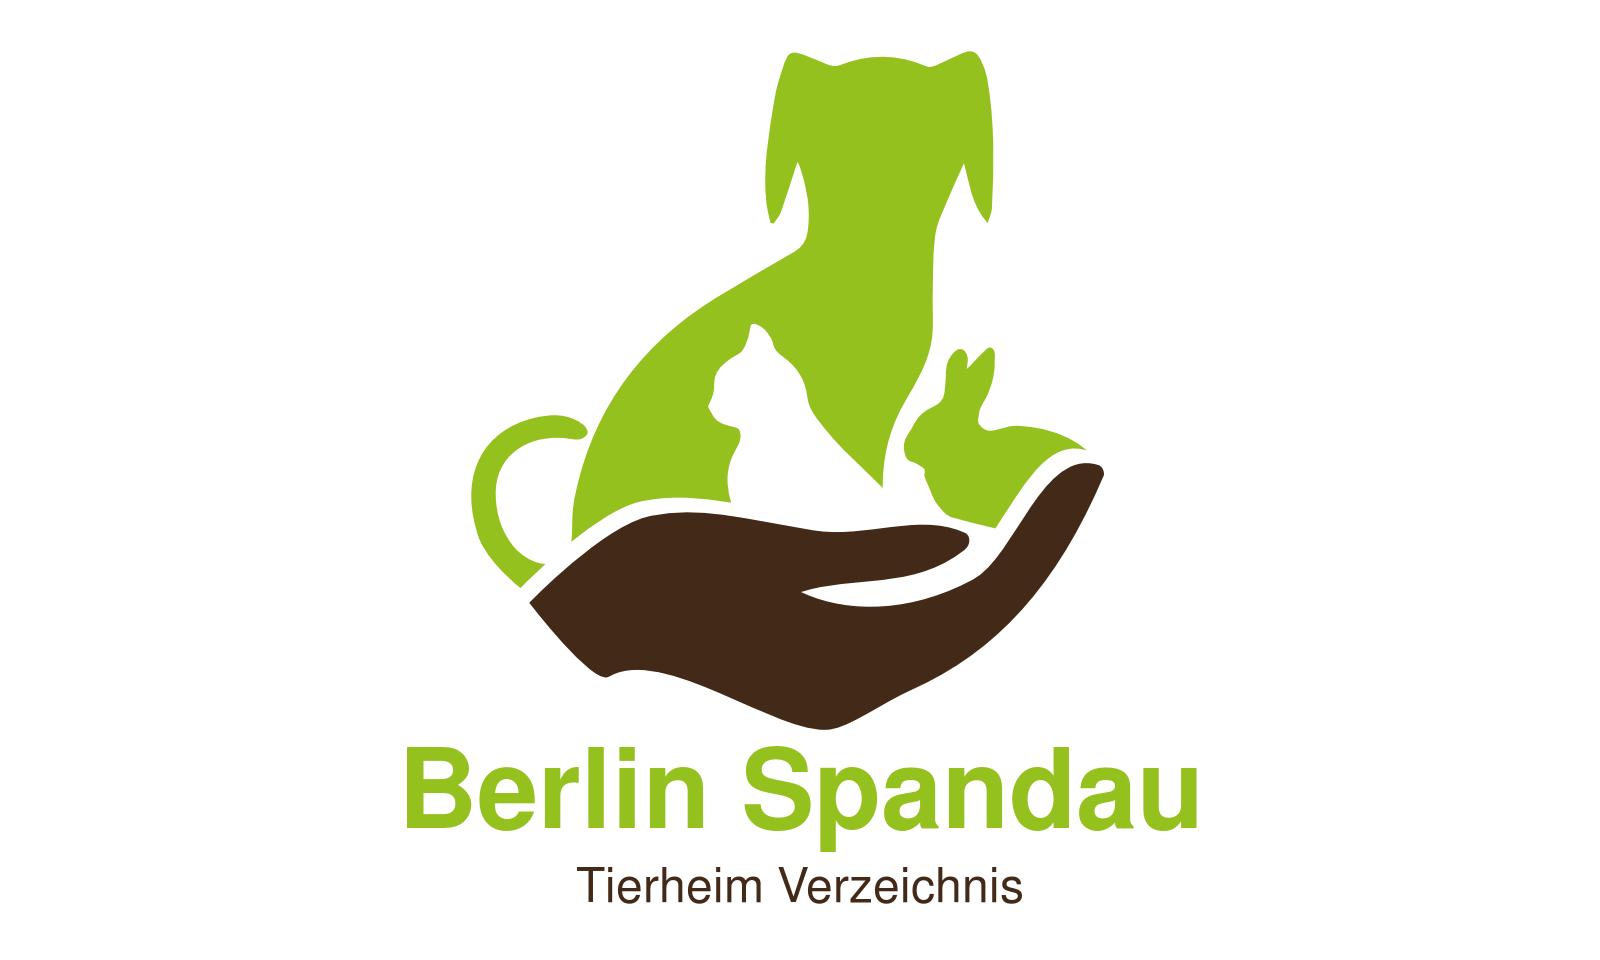 Tierheim Berlin Spandau